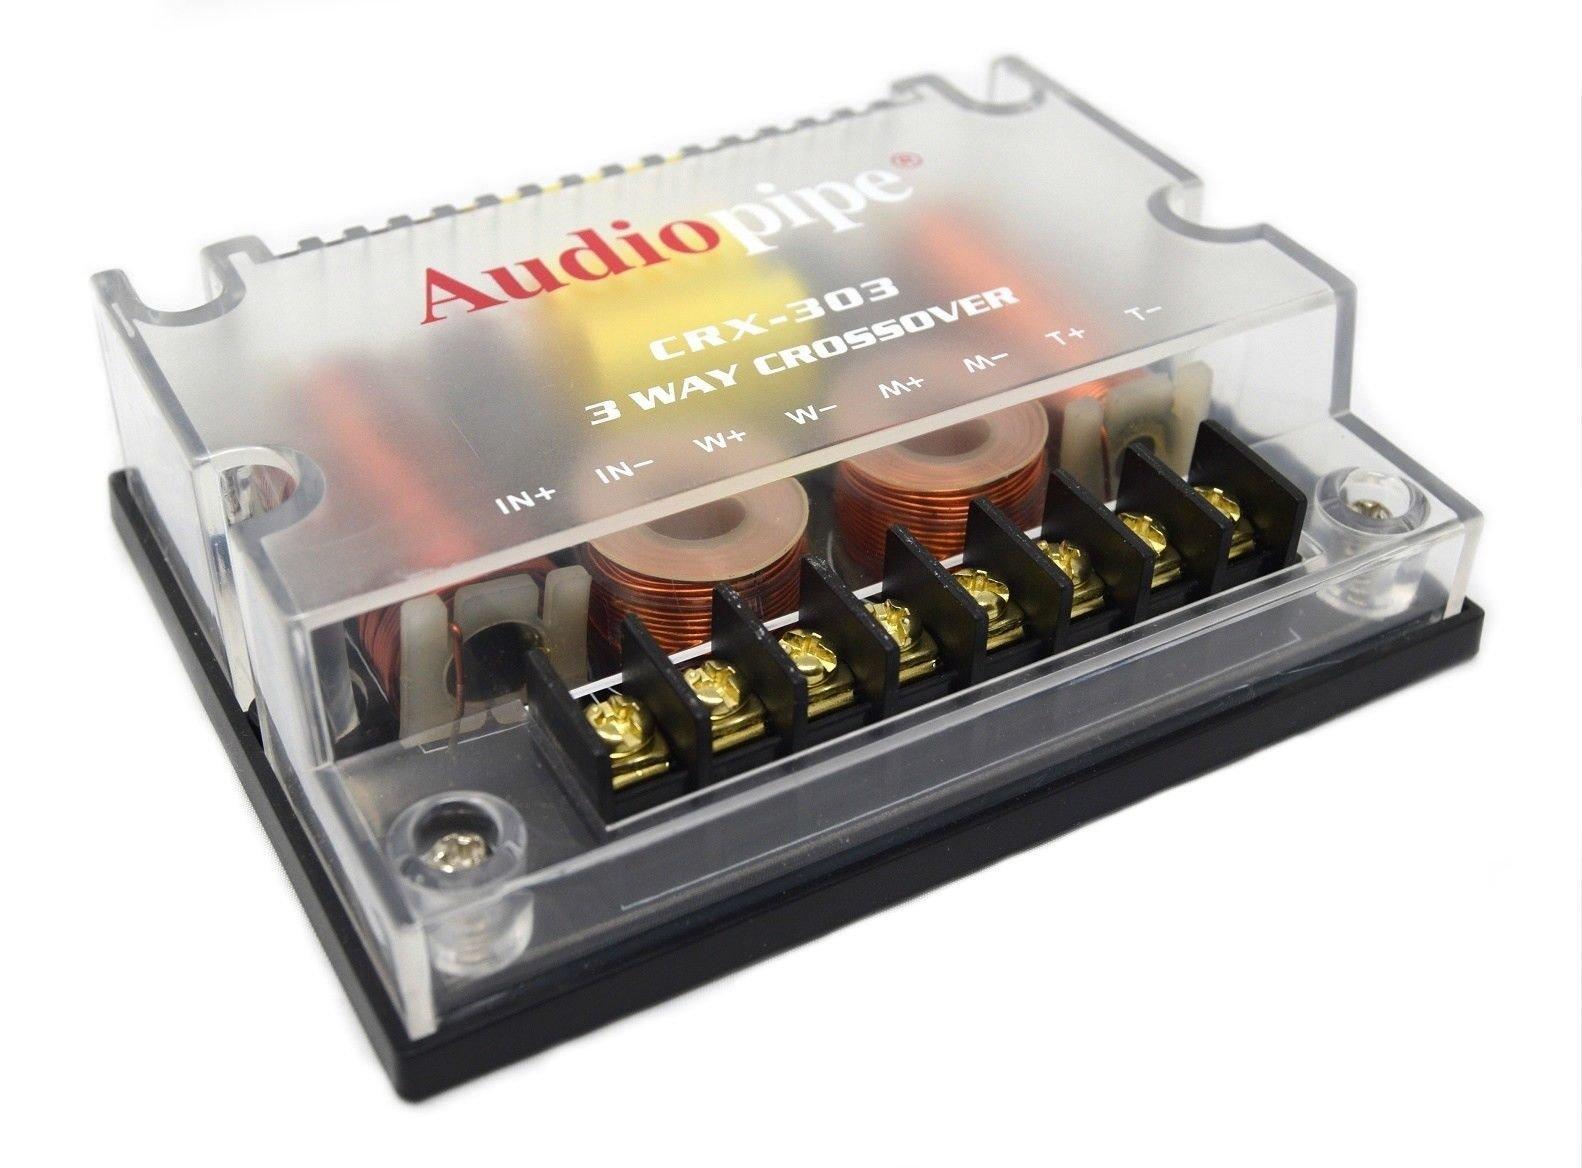 Audiopipe 3 Way Crossover CRX-303 300 Watts Passive Crossover Car Audio 4 Ohm